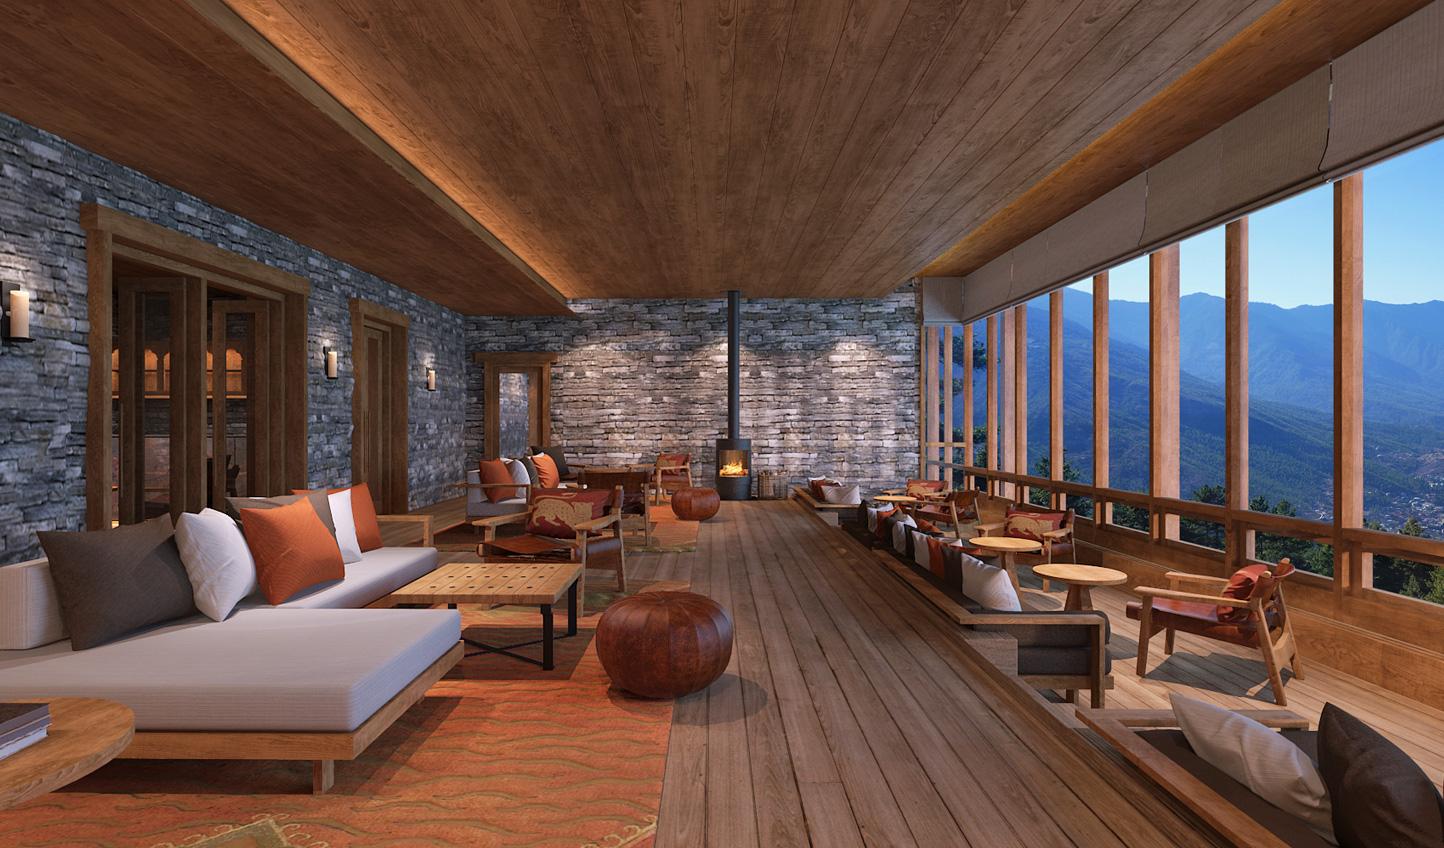 A sense of wellness pervades every inch of Six Senses Bhutan